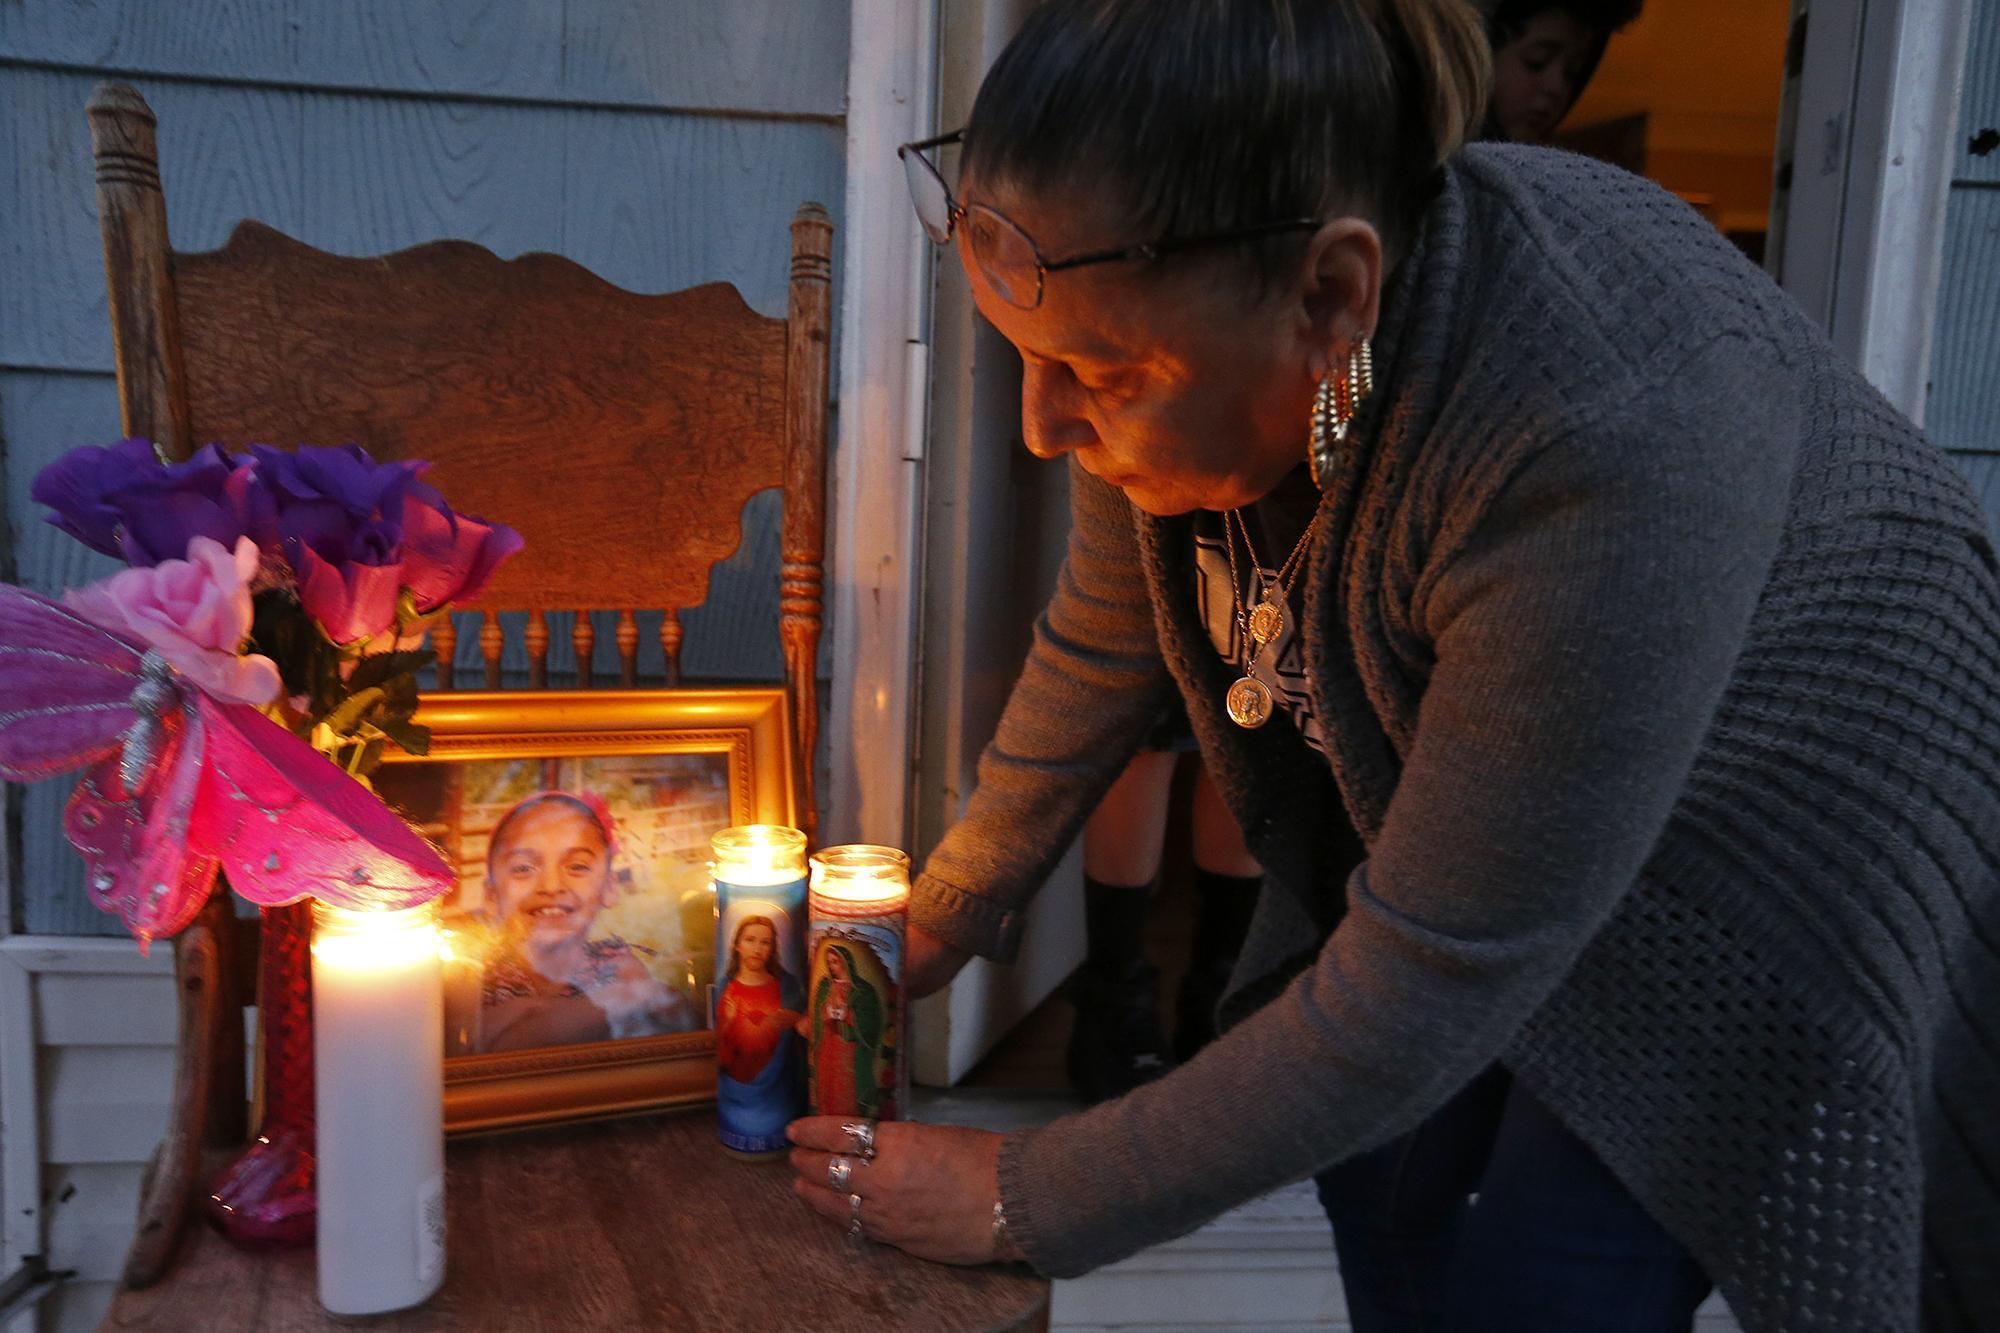 San Antonio Girl 10 Fatally Shot In Her Bedroom San Antonio Express News